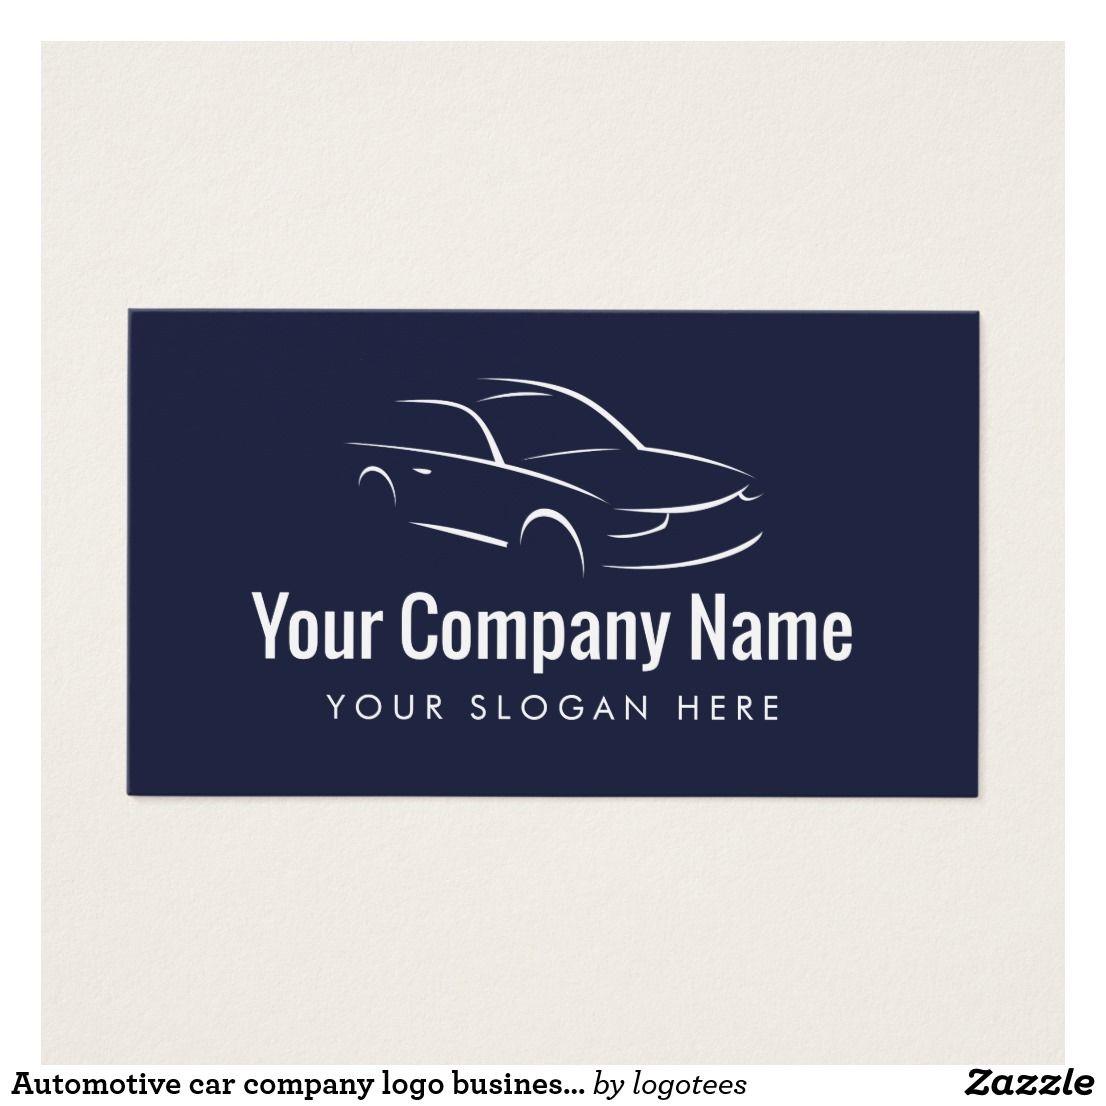 Automotive car company logo business card template | Company logo ...